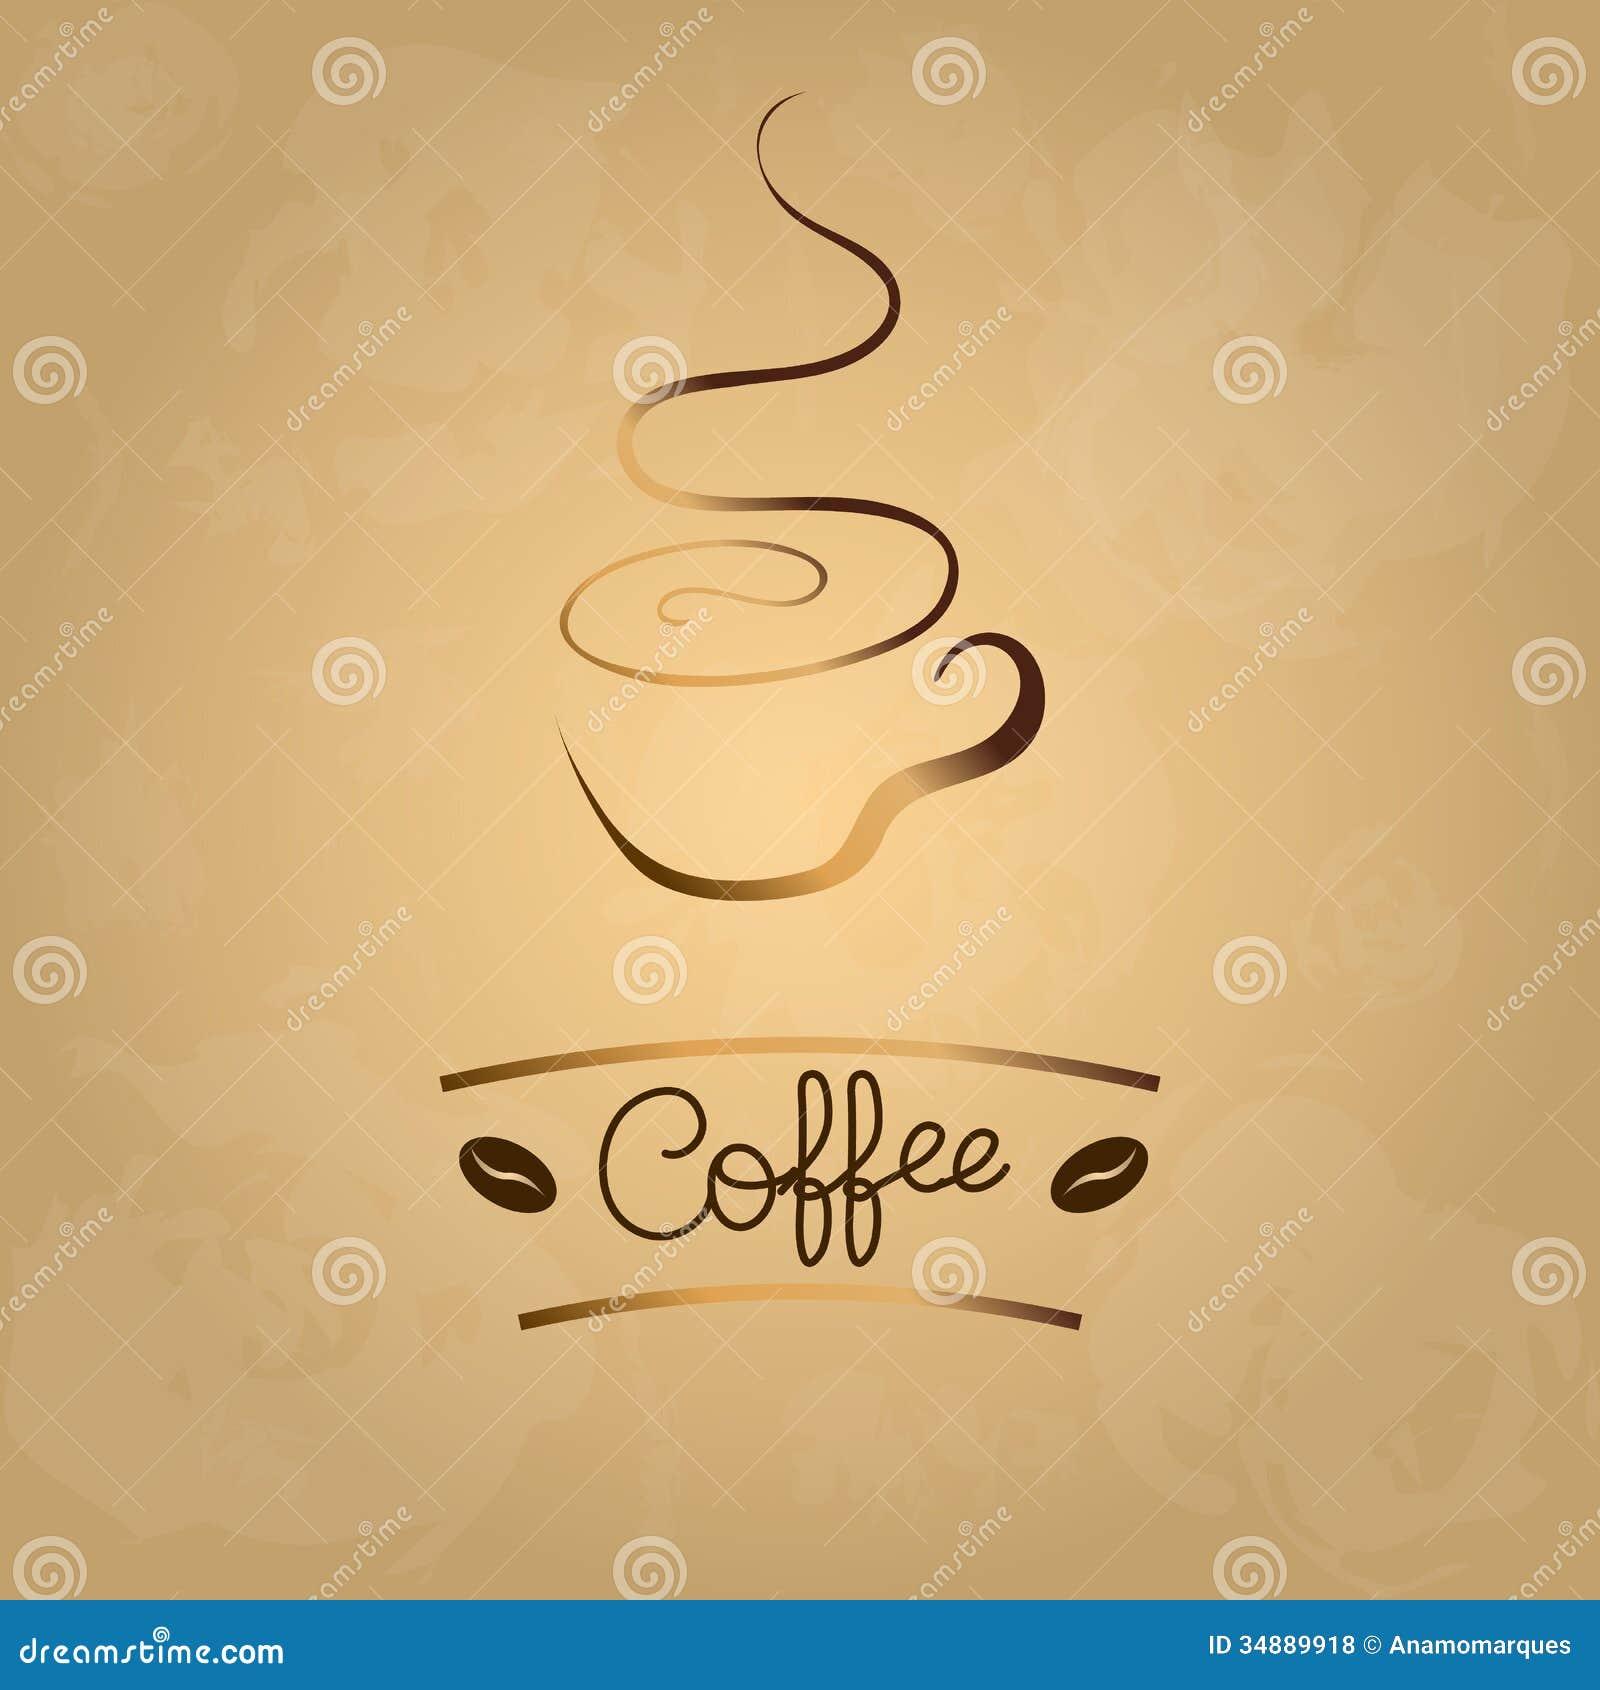 Coffee Menu Stock Vector. Illustration Of Elegance